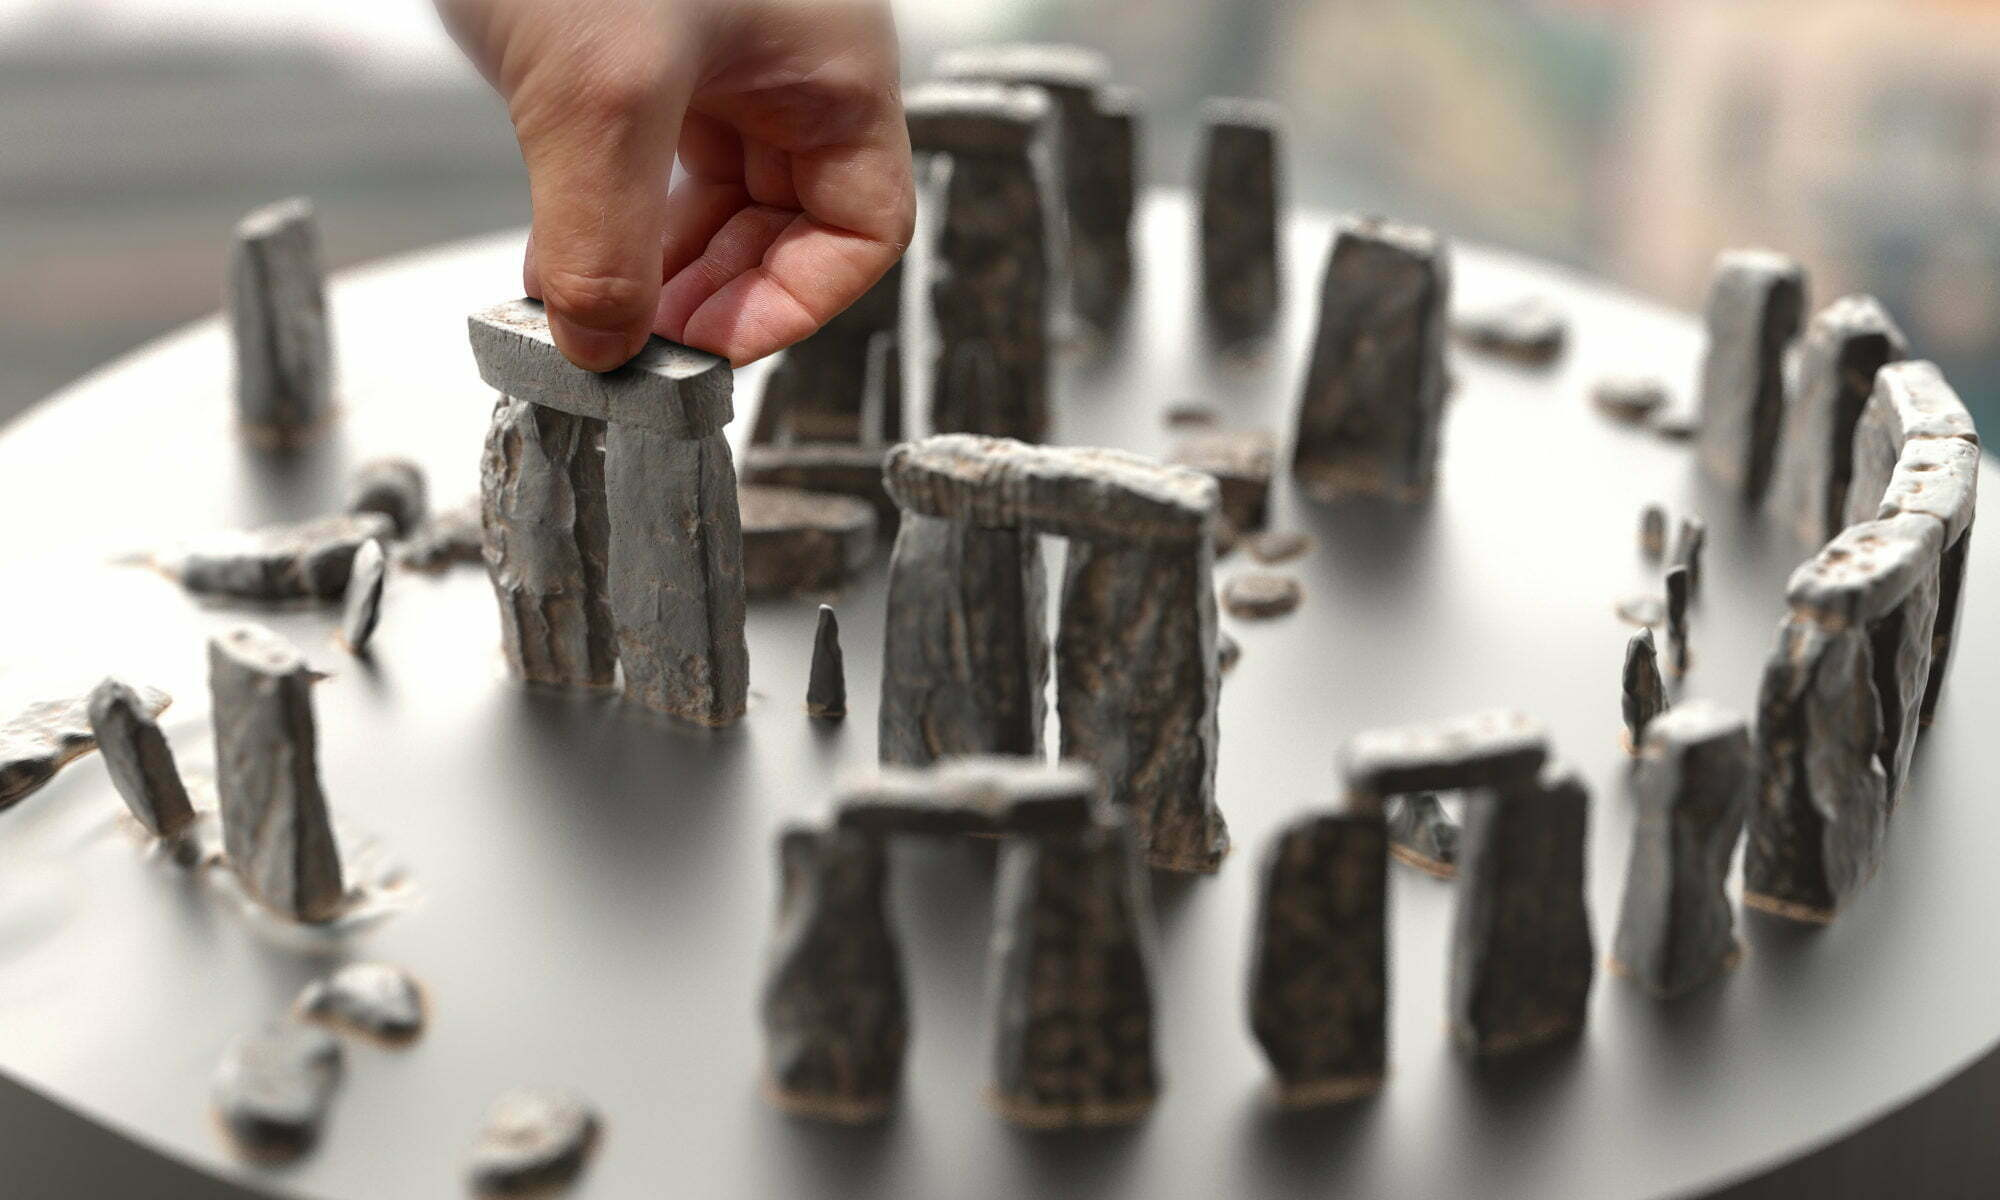 Buy Stonehenge Models: office back t2 stone 54 2000x1200  - 76th renders - 76th renders